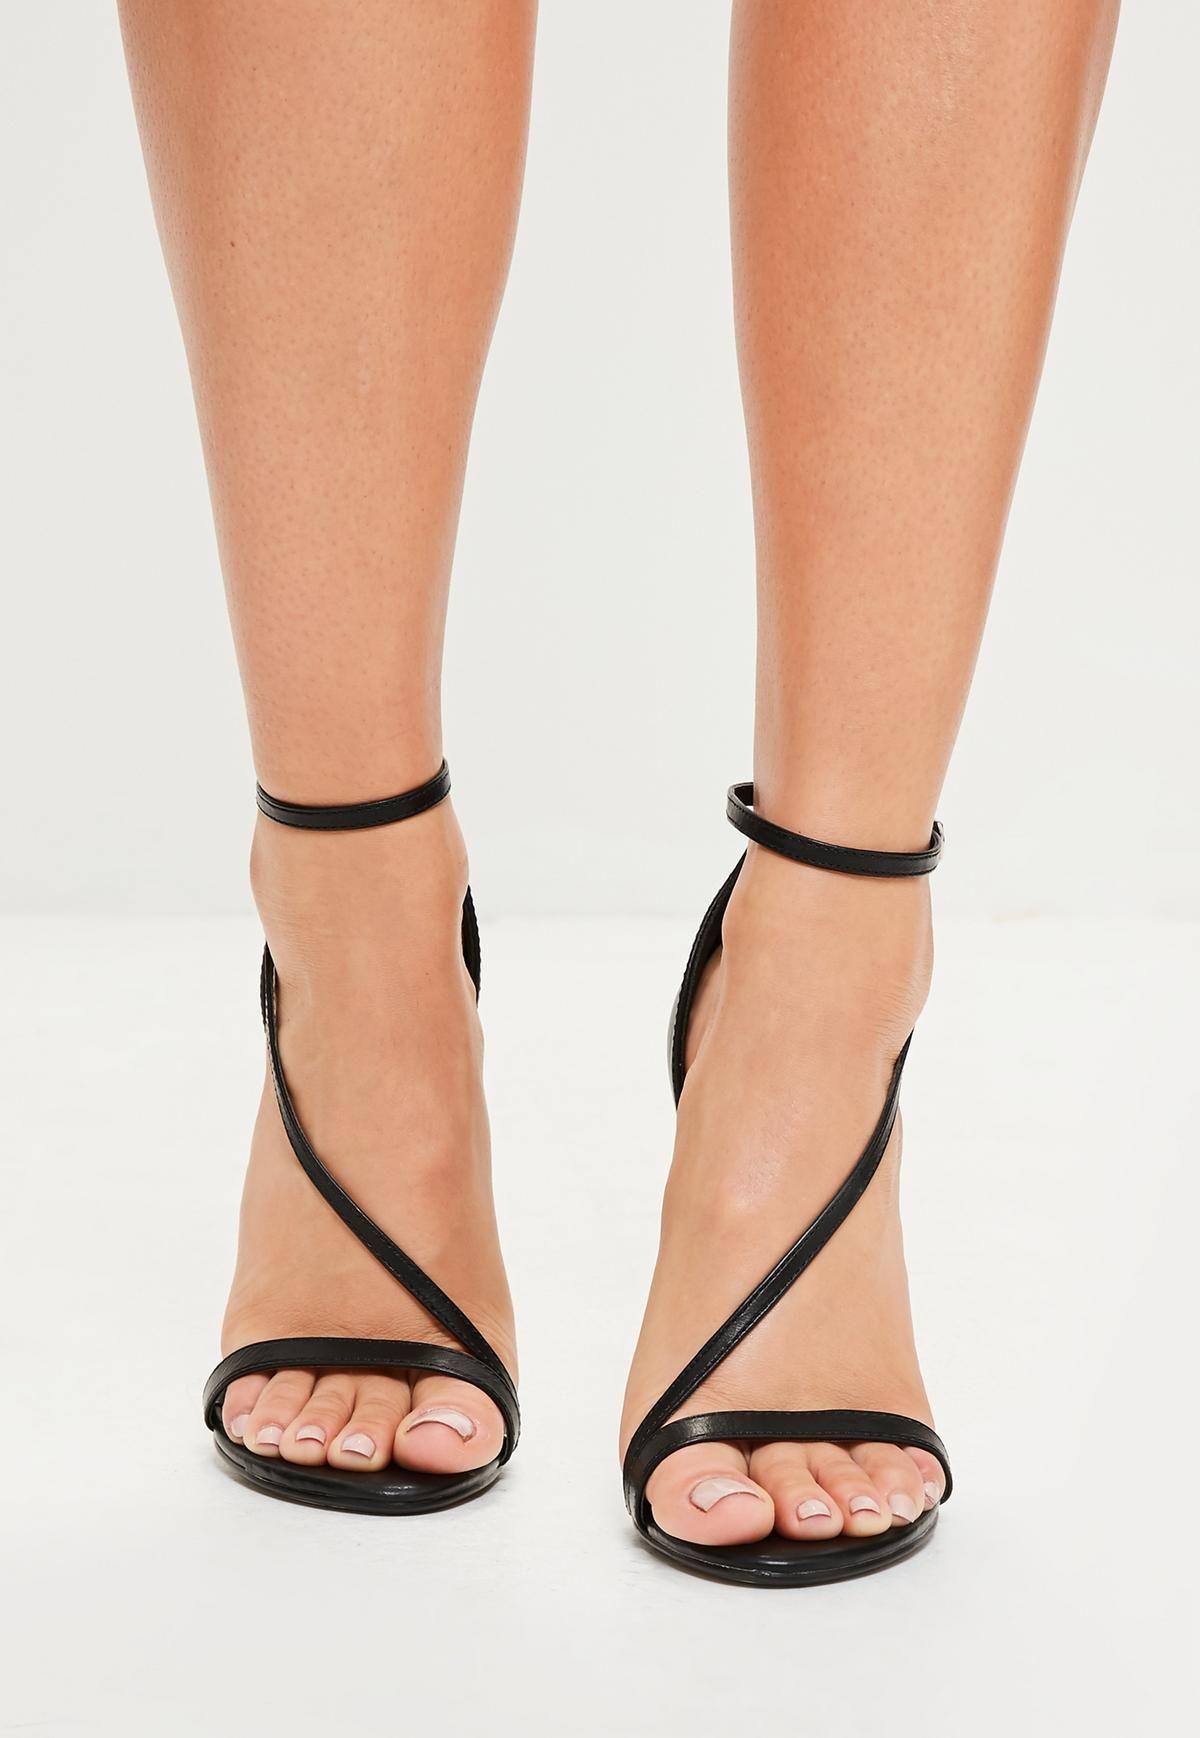 dcdb7dbffaa2b0 black asymmetric barely there heels